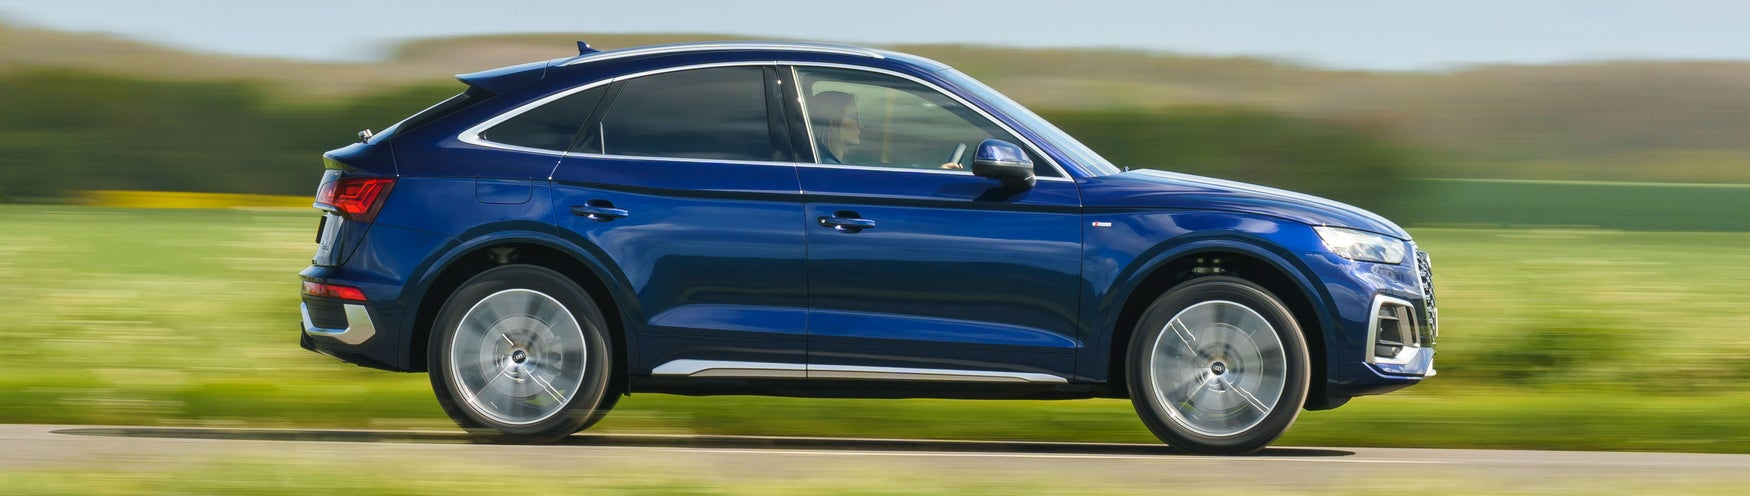 Audi Q5 Sportback dynamic